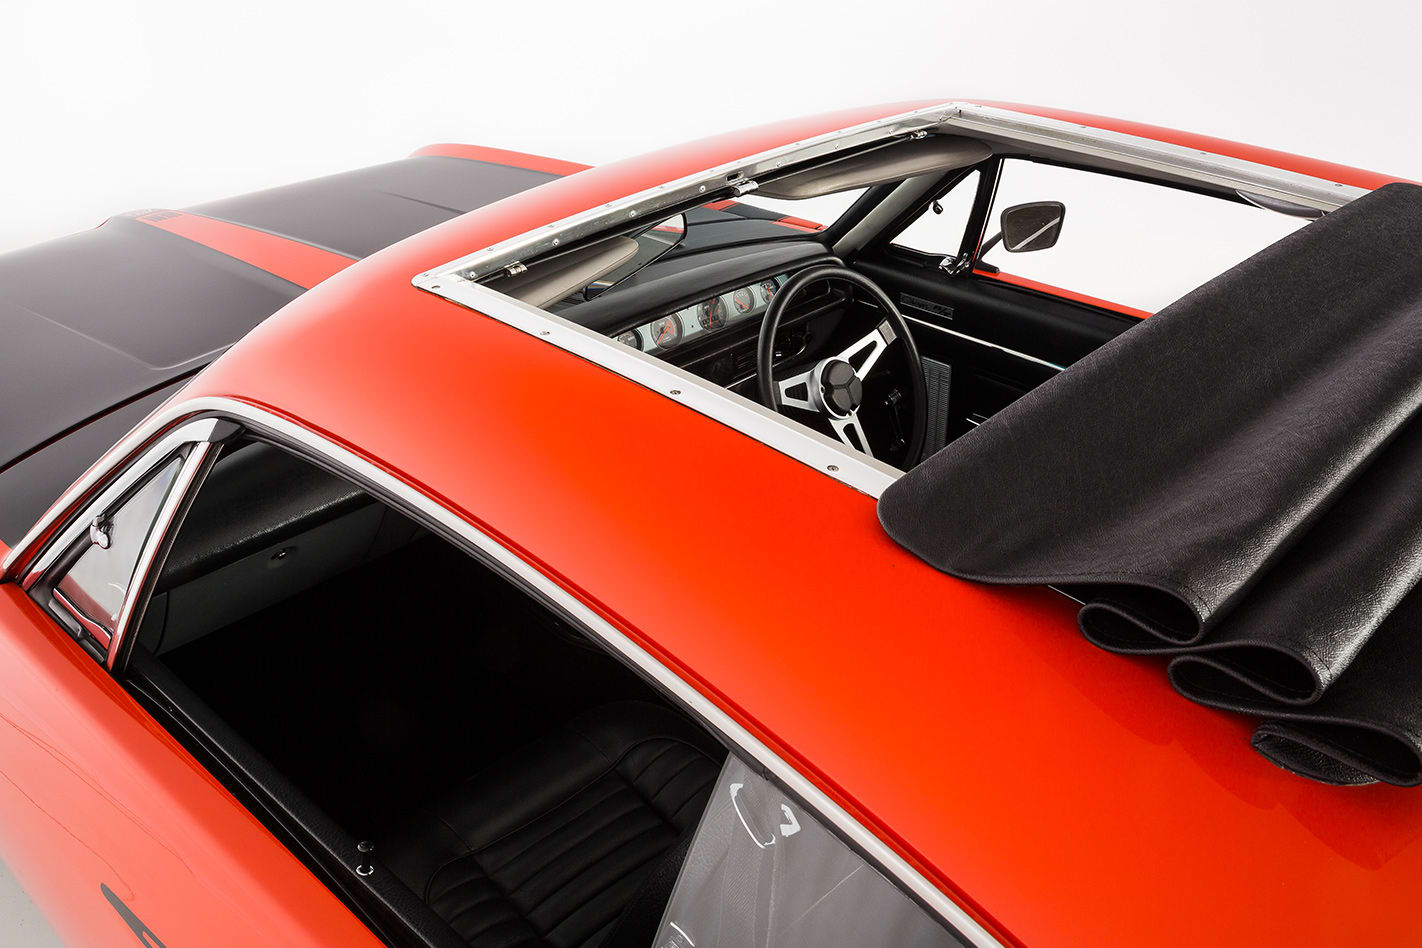 Chrysler Charger sunroof